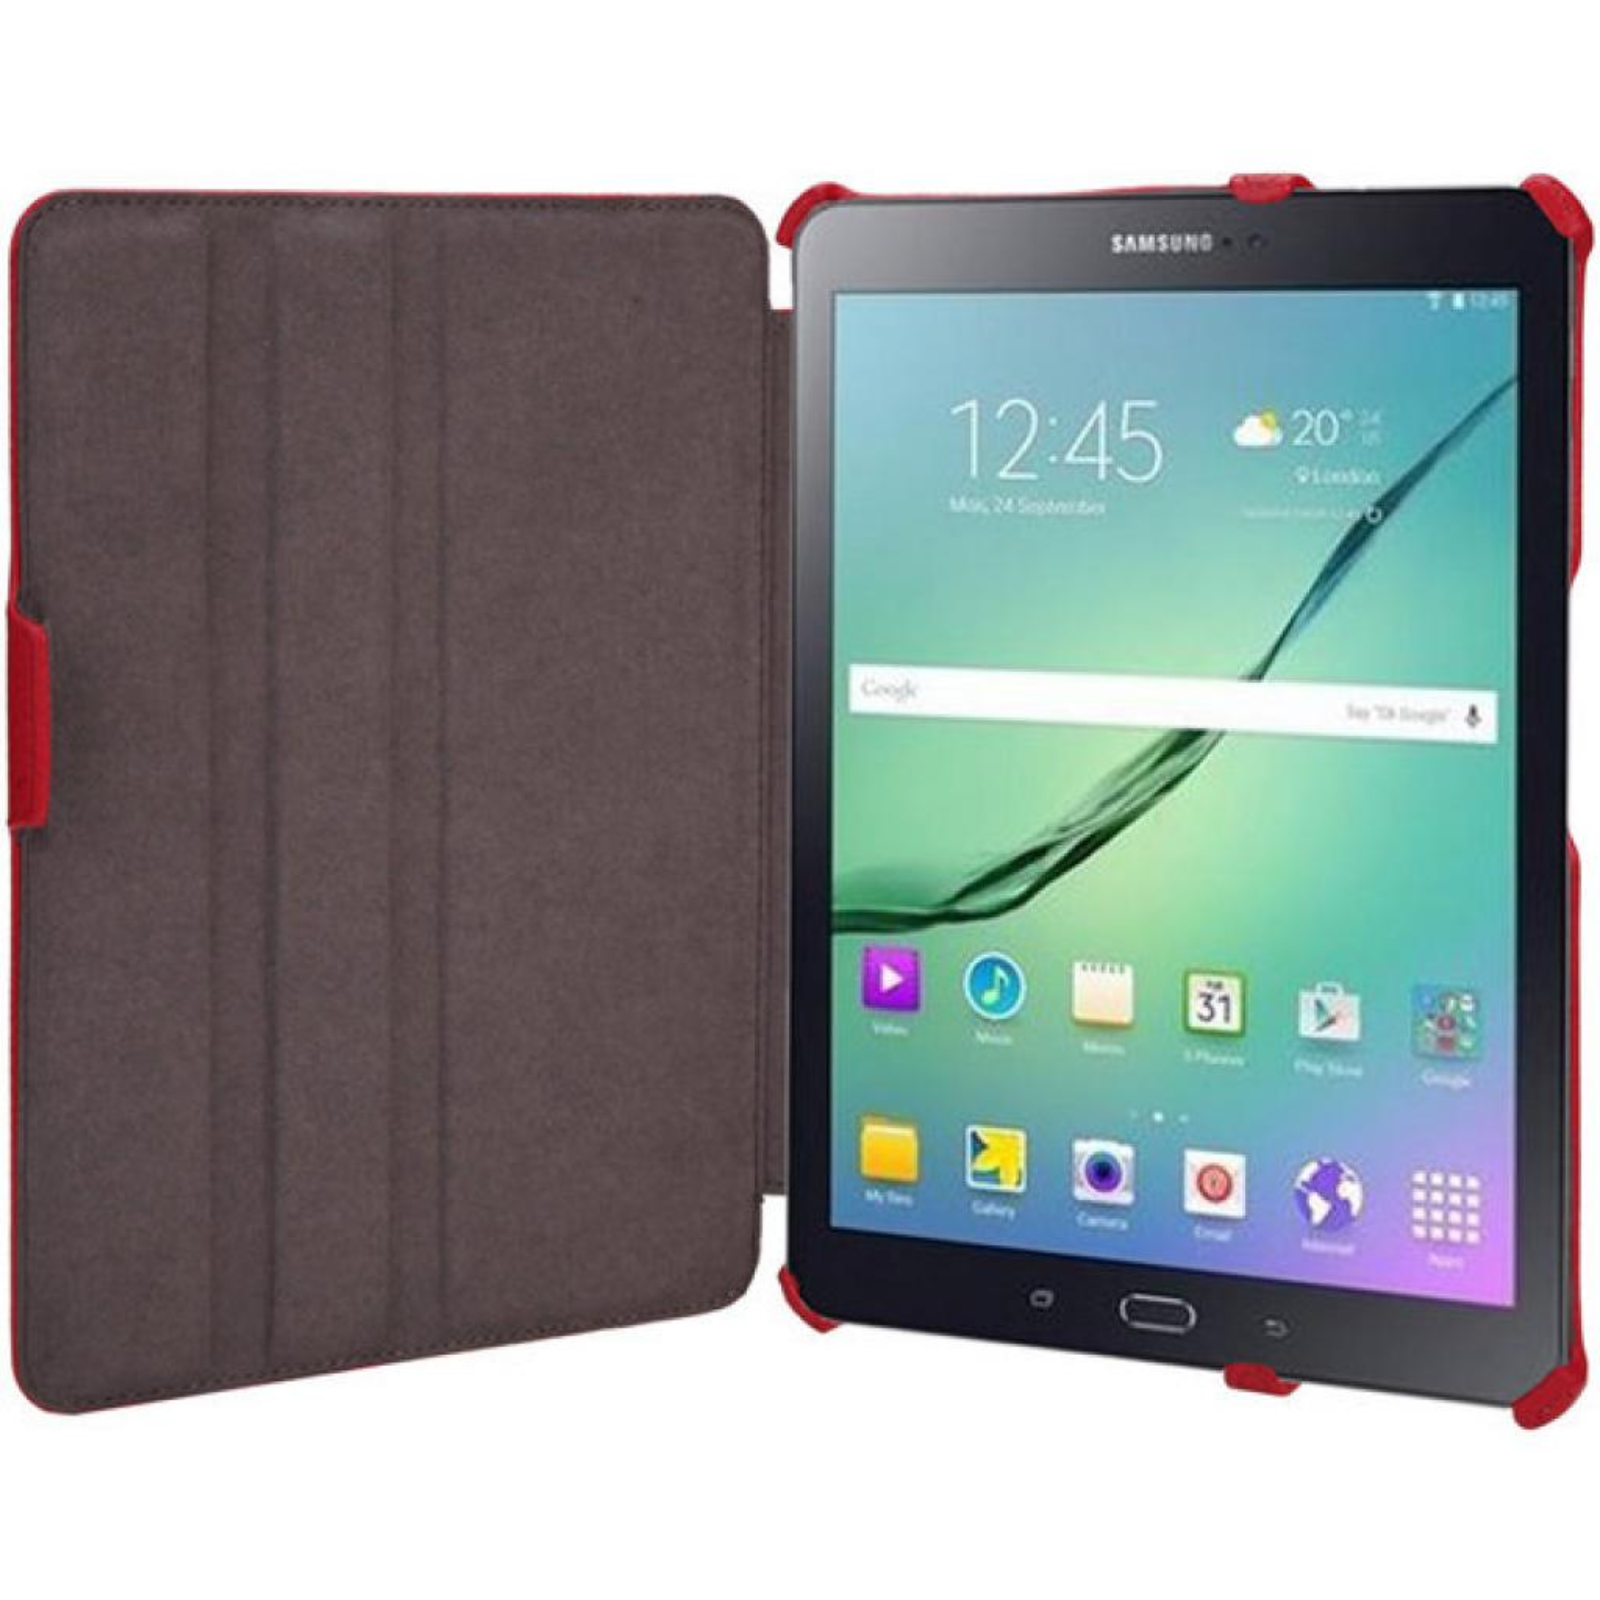 Чехол для планшета AirOn для Samsung Galaxy Tab S 2 8.0 red (4822352777524) изображение 8